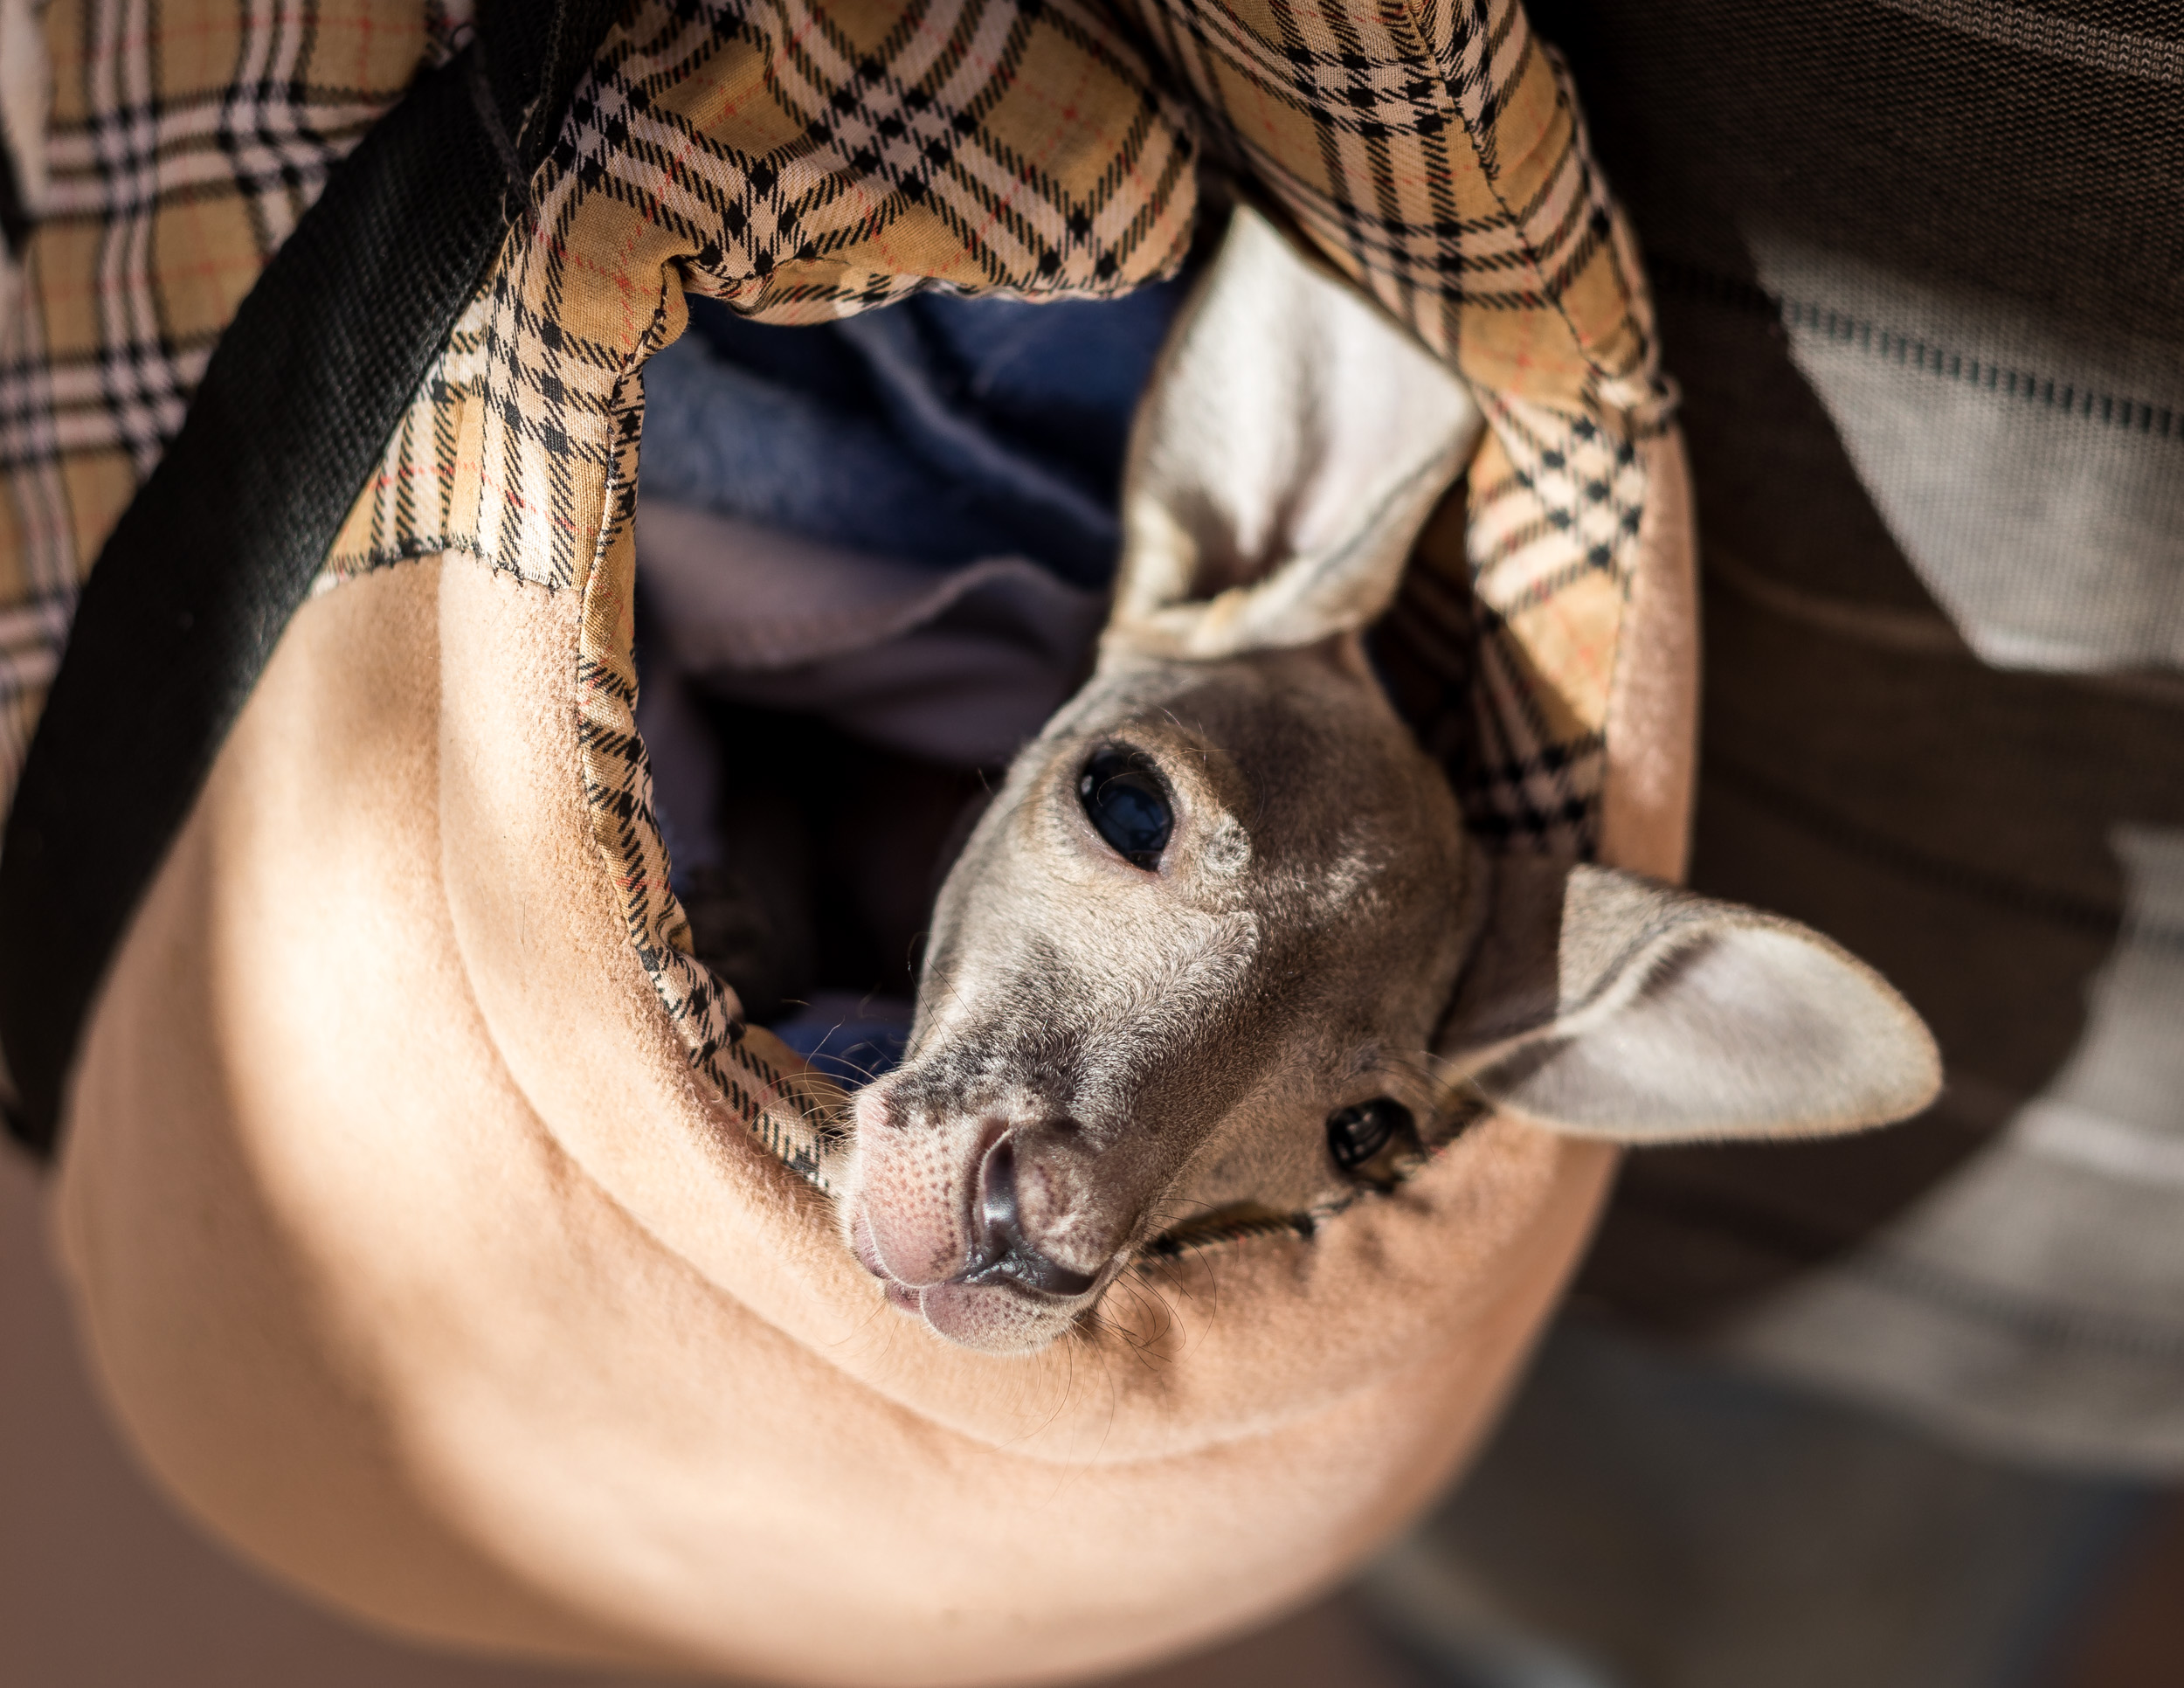 Josephine's Kangaroo Sanctuary, Coober Pedy